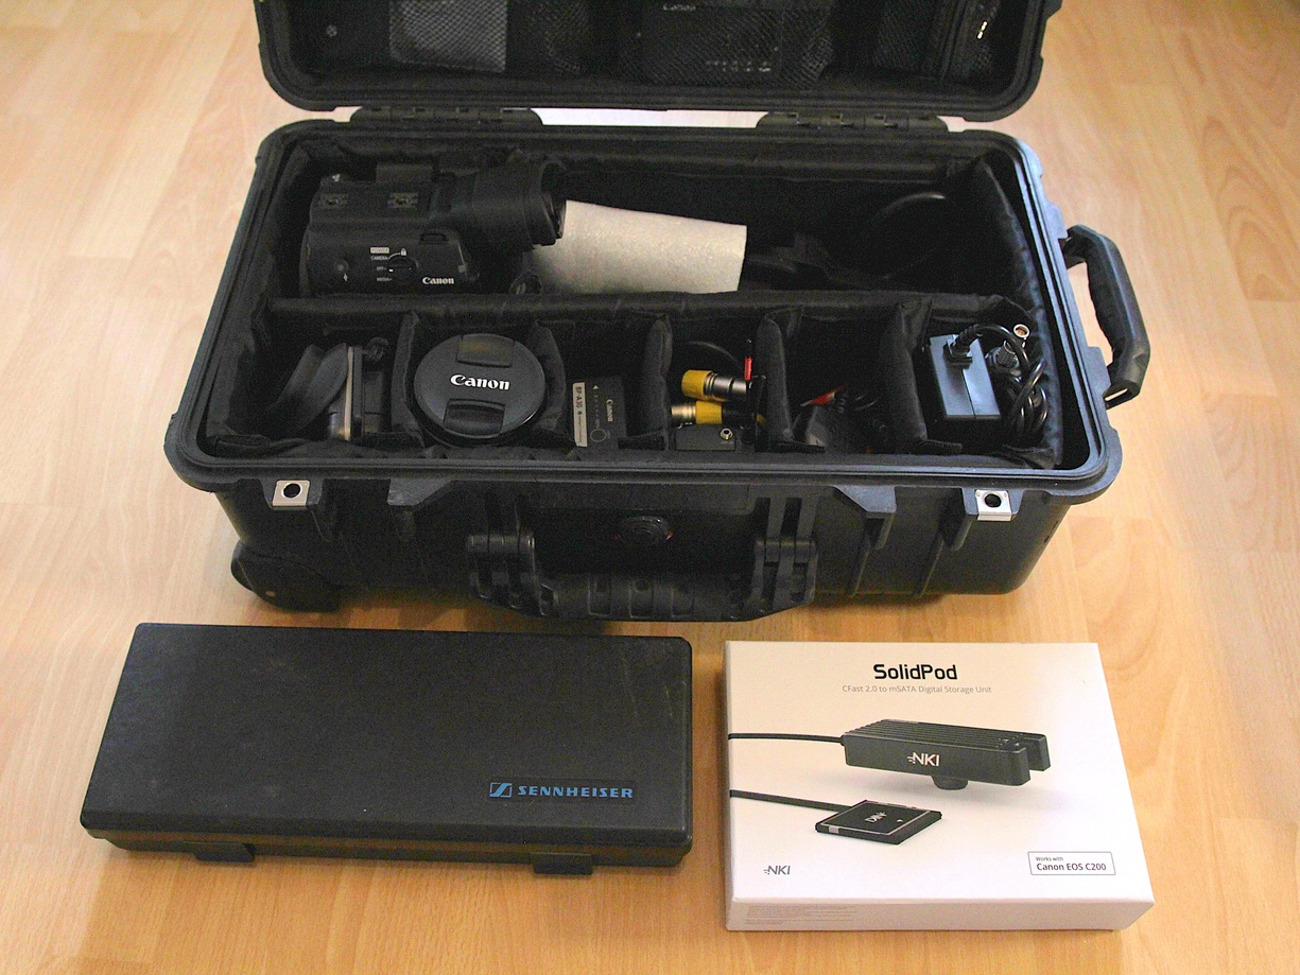 Canon C200 + Manfrotto Tripod + 24-105mm + 1TB Solidpod + Sennheiser G4 and  ME66 Audio Kit